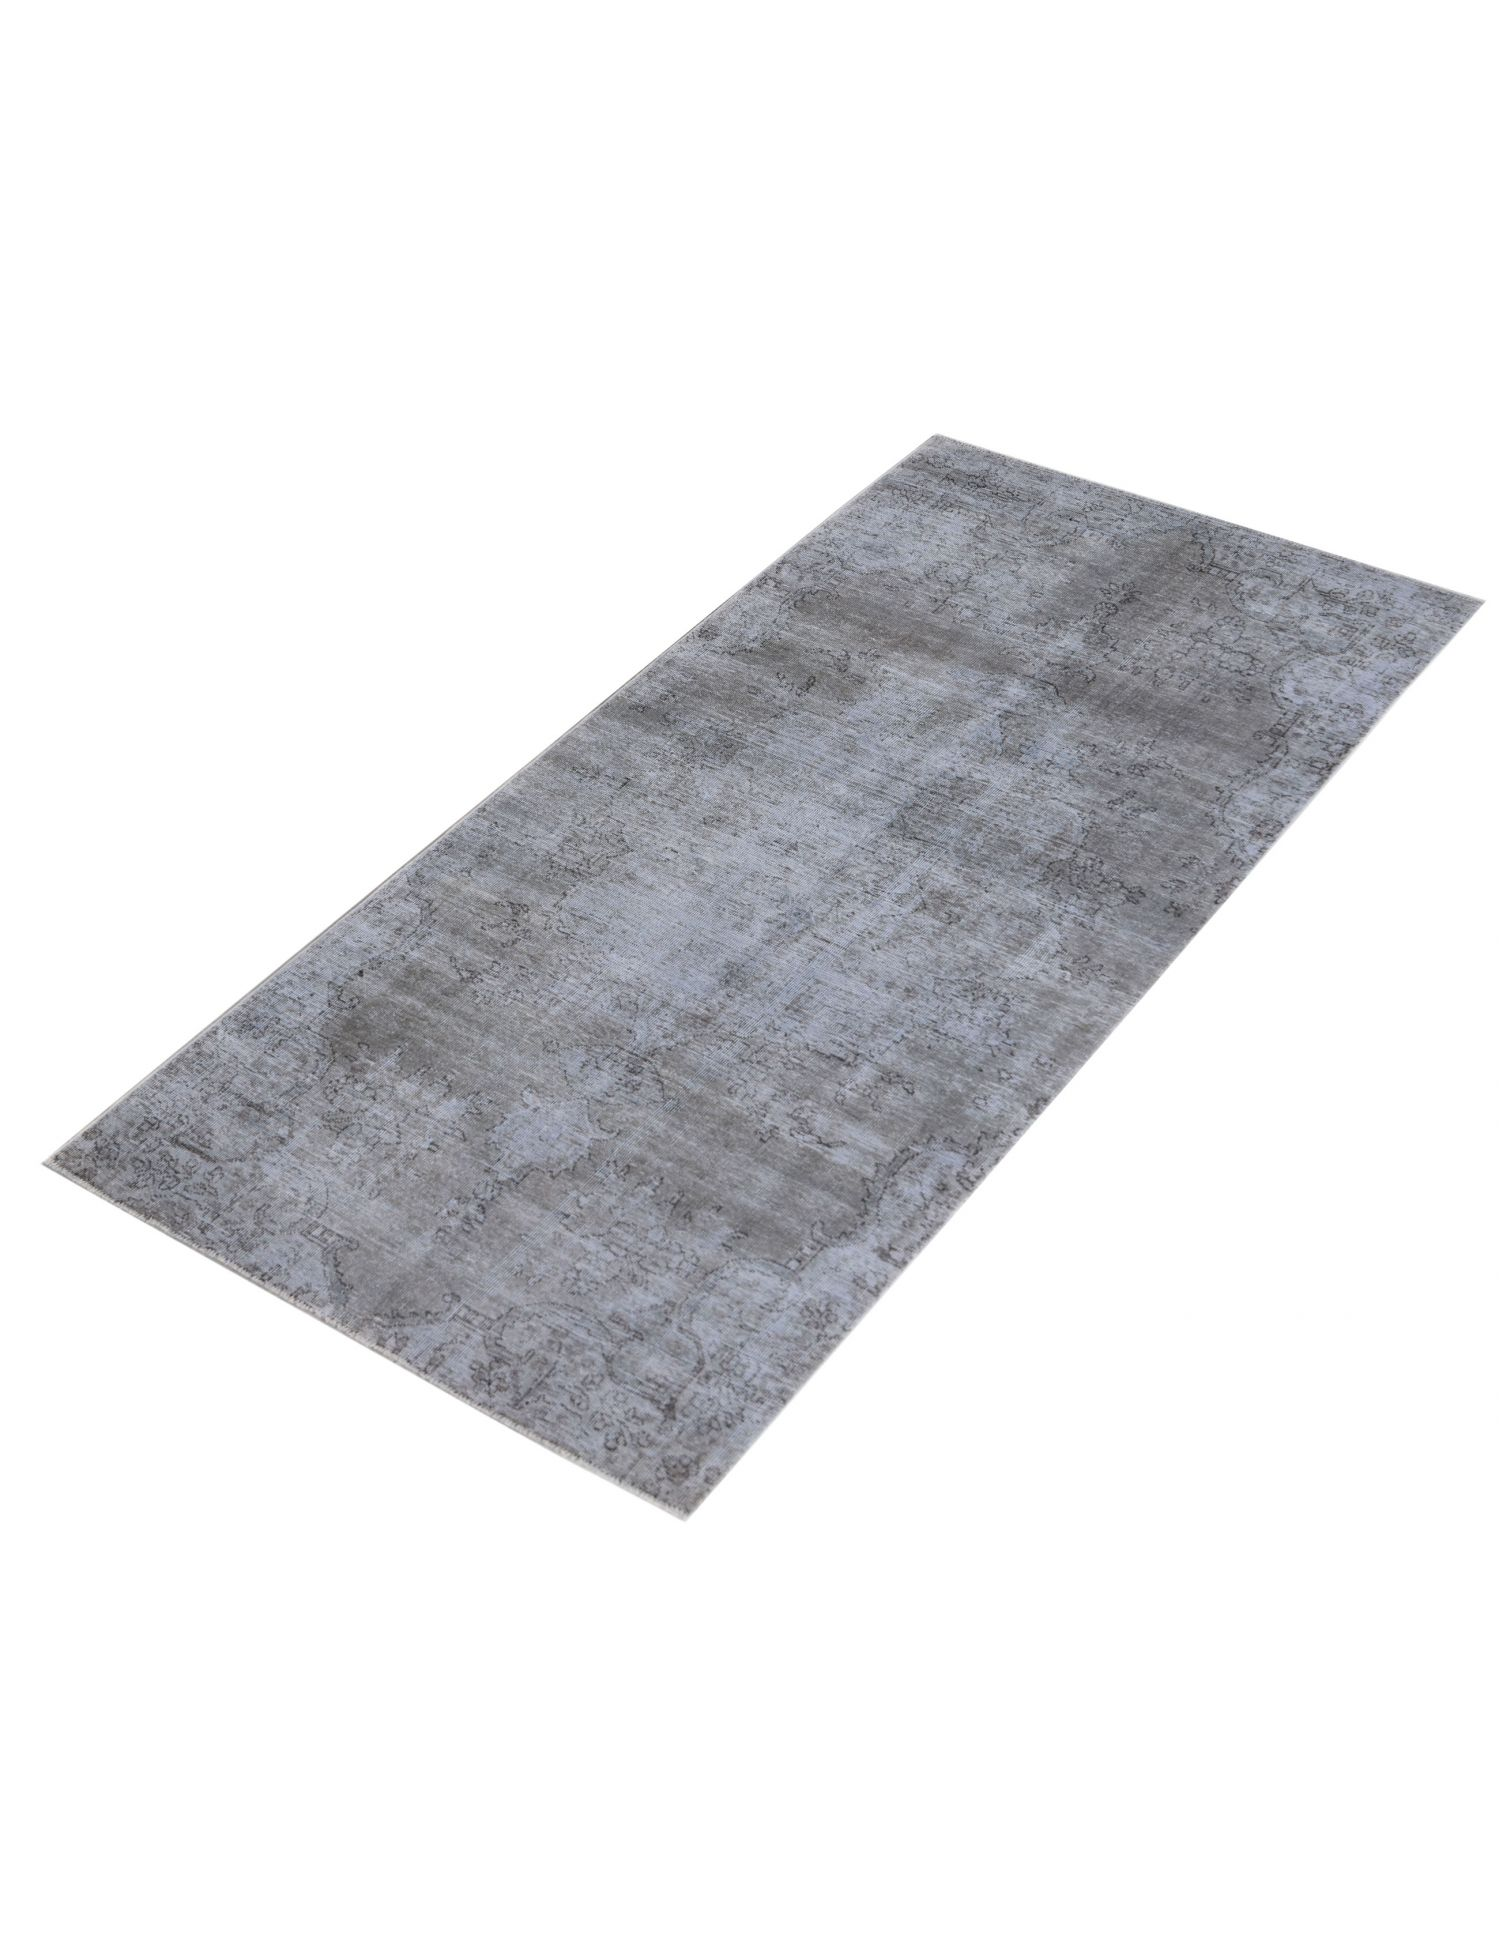 Vintage Perserteppich  grau <br/>239 x 118 cm